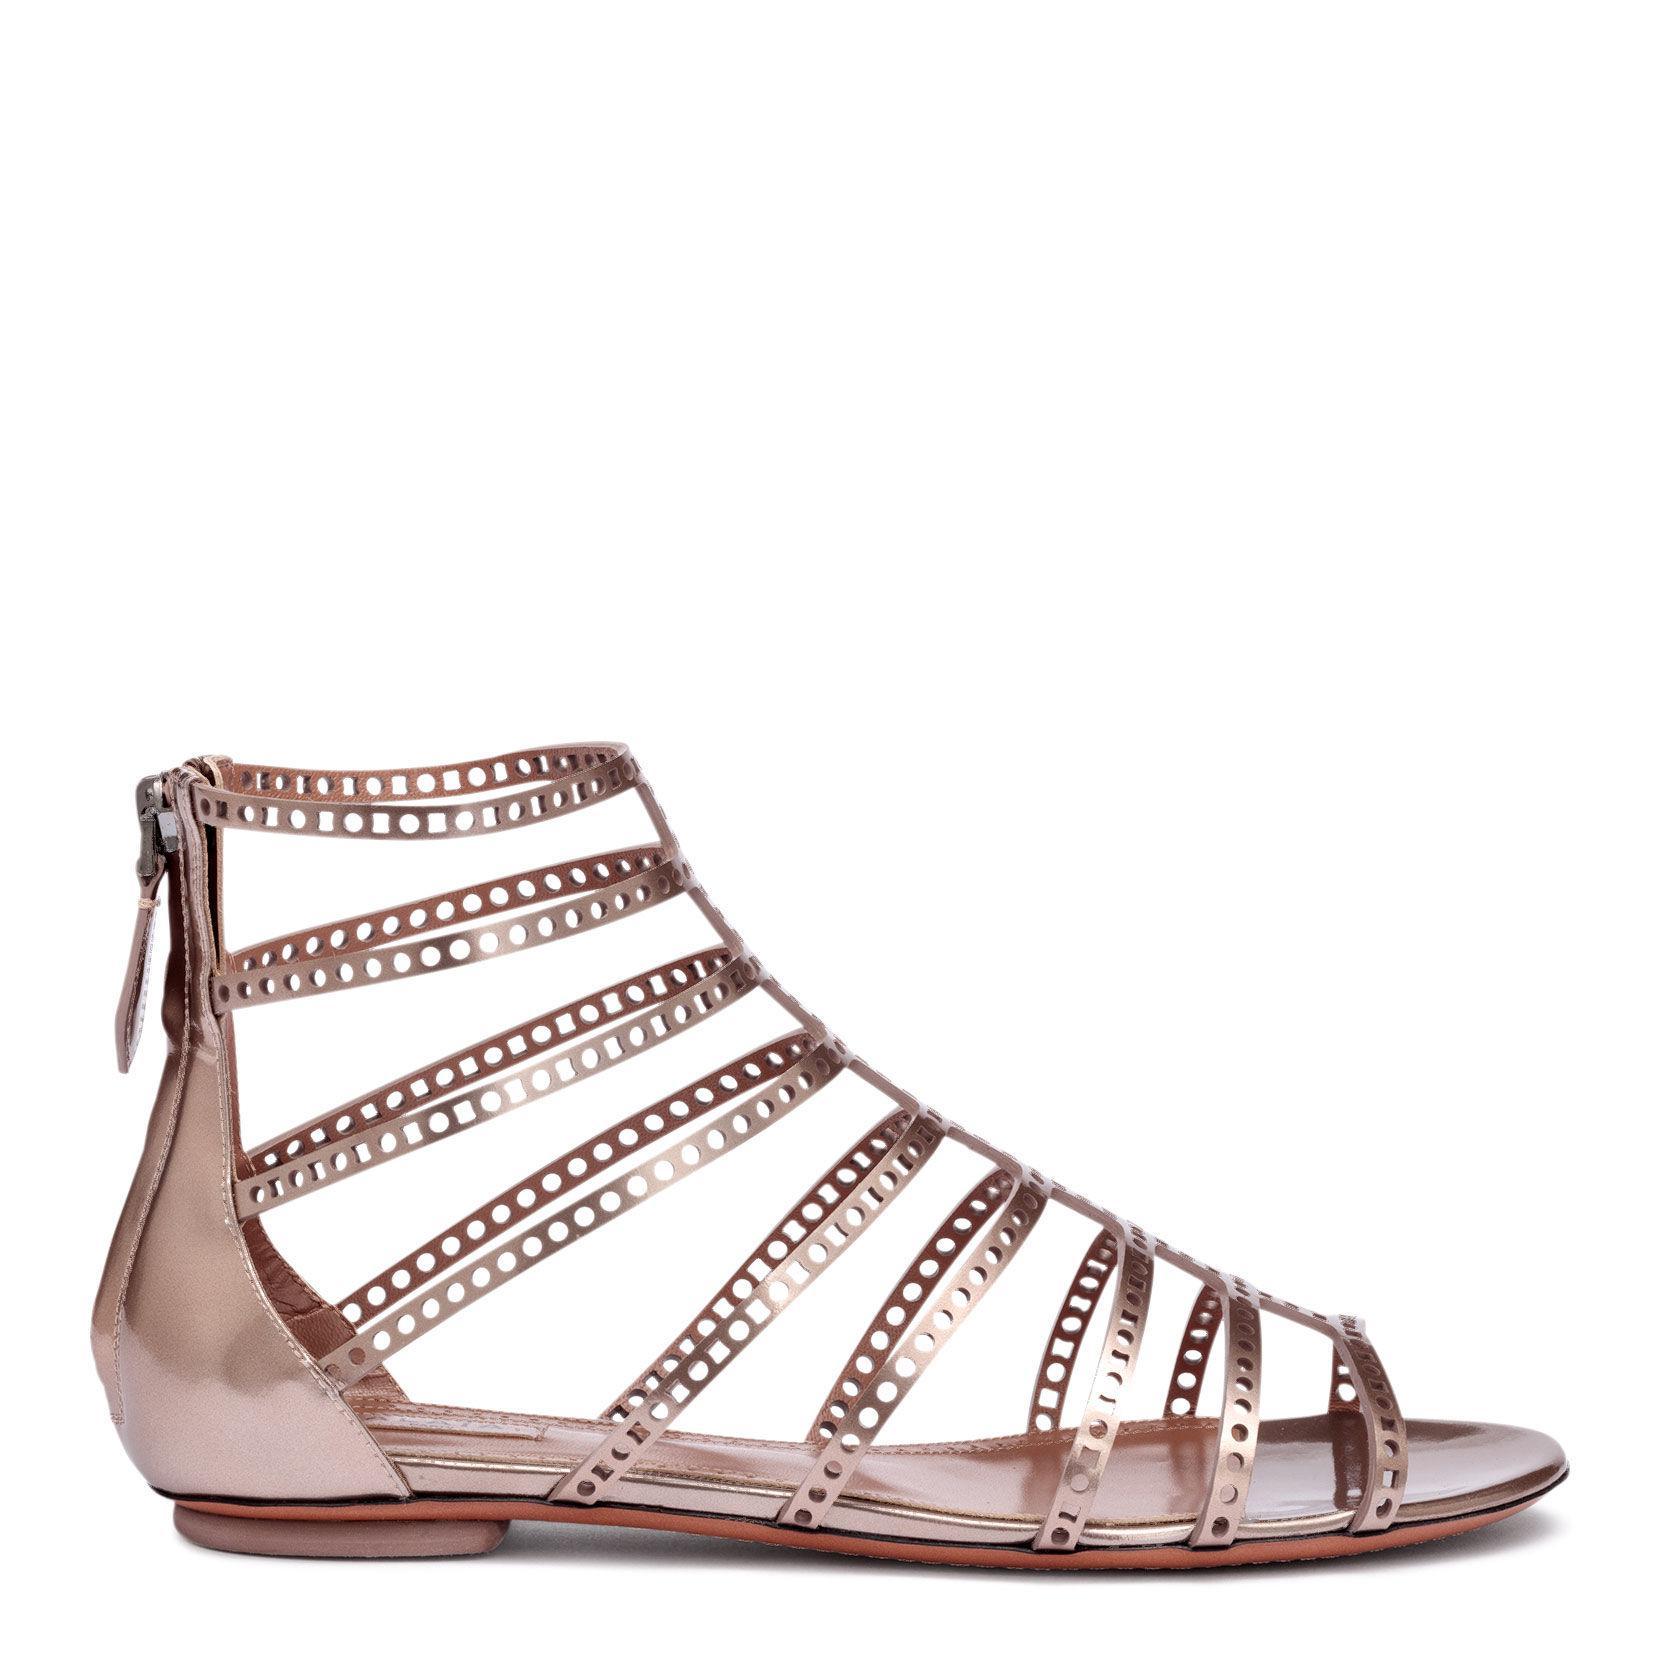 978662dc85fd3 Alaïa - Multicolor Metallic Laser-cut Leather Sandals - Lyst. View  fullscreen